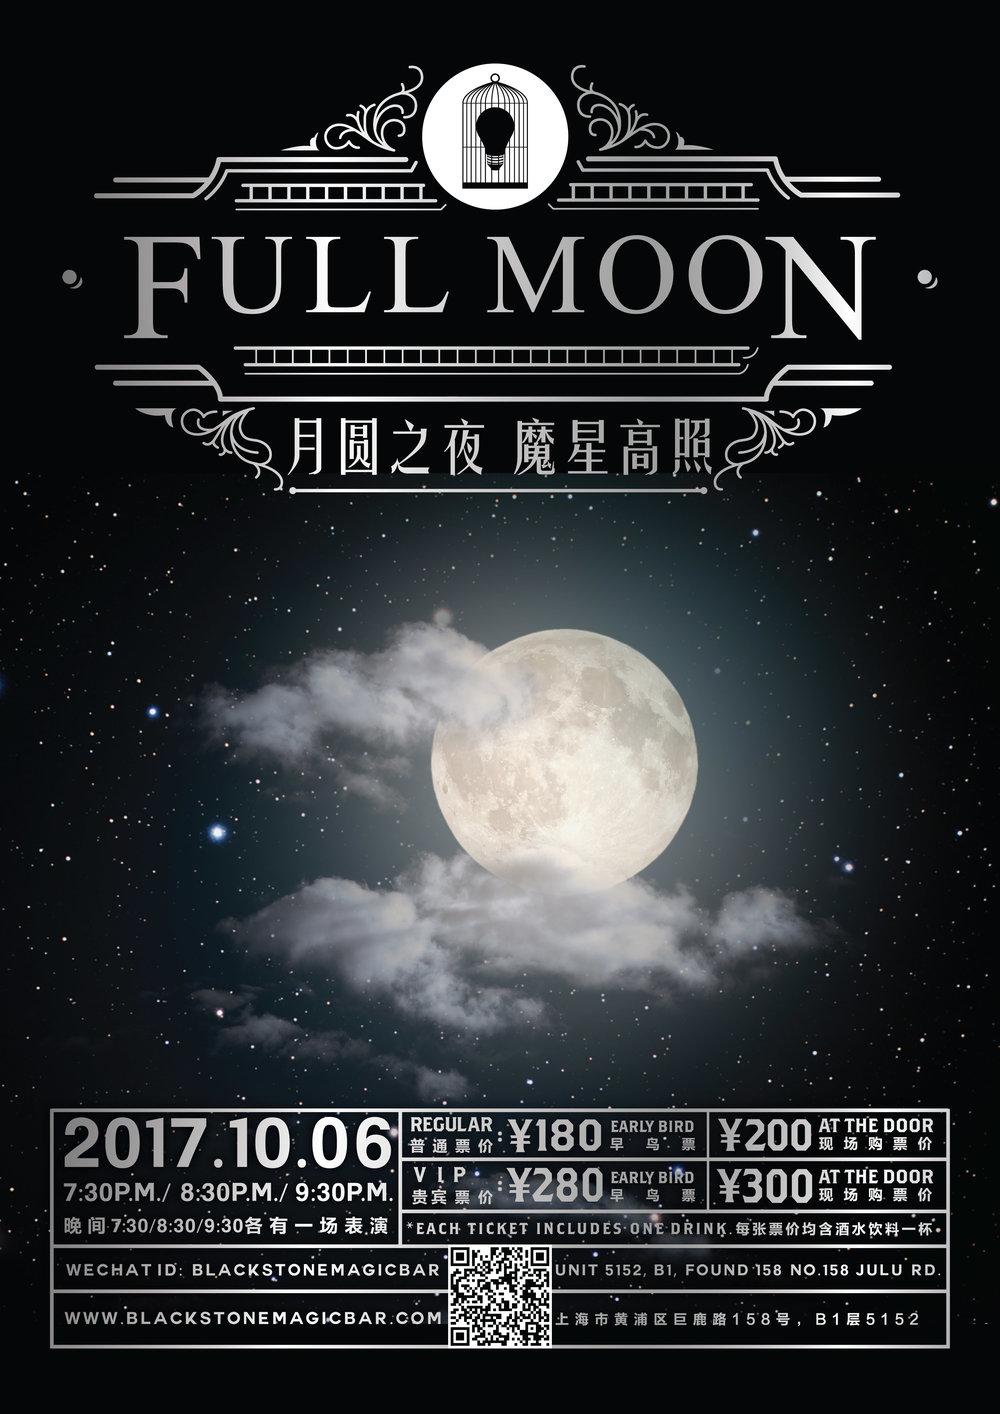 BLACKSTONE LIVE - 《FULL MOON》中秋特别演出